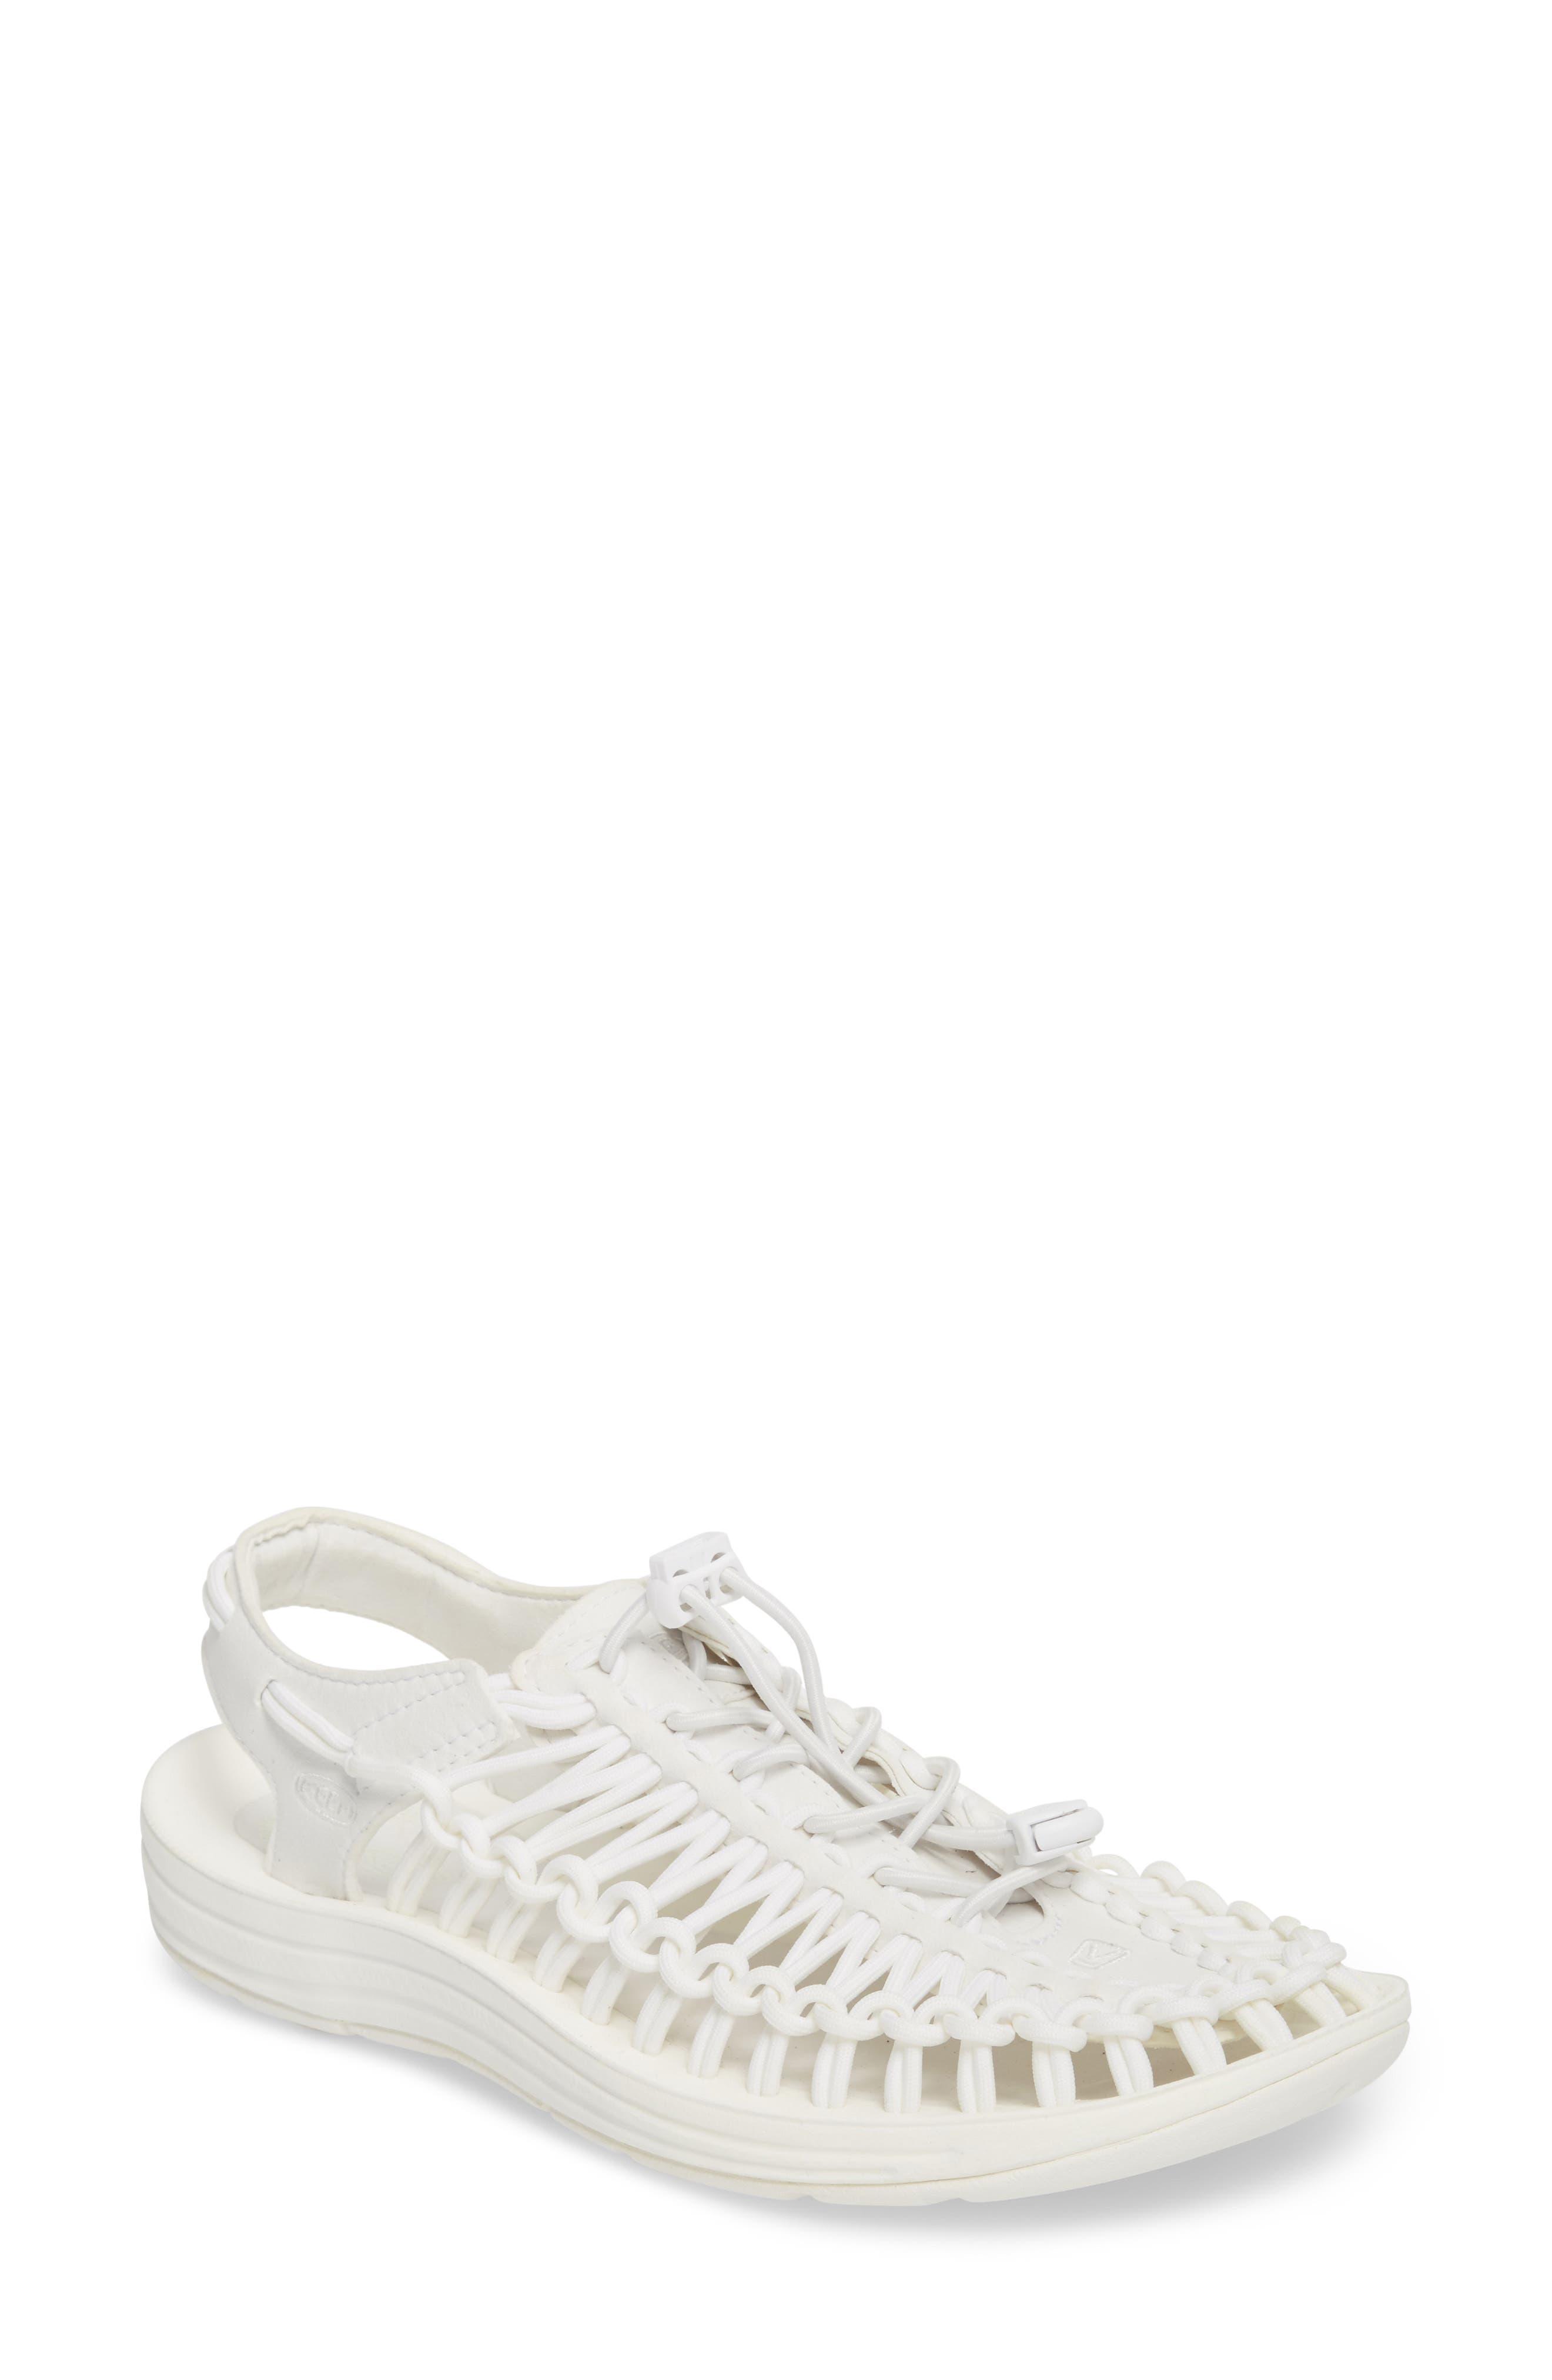 'Uneek' Water Sneaker,                         Main,                         color, Star White